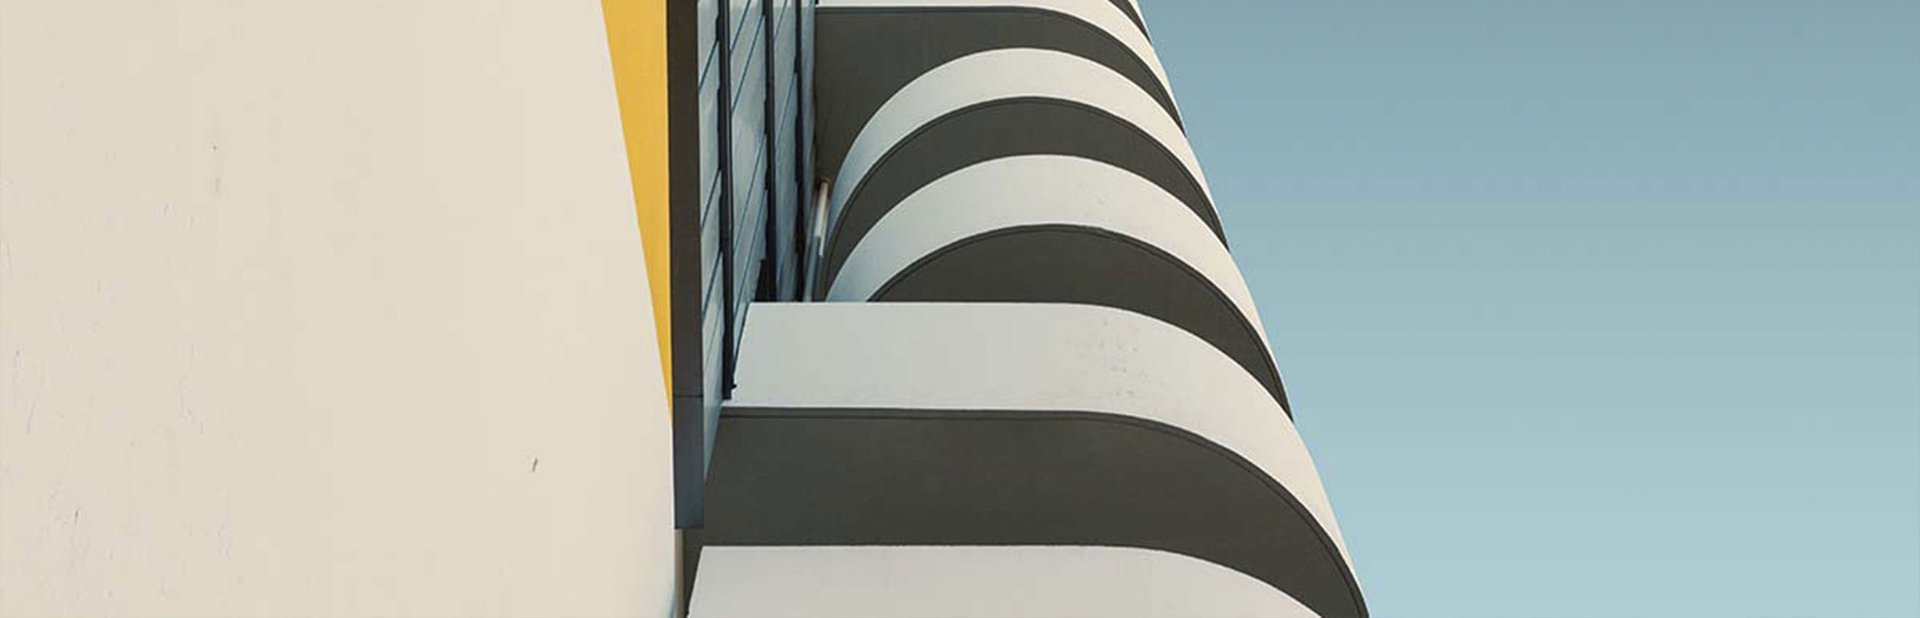 postgrado experto arquitectura aplicada